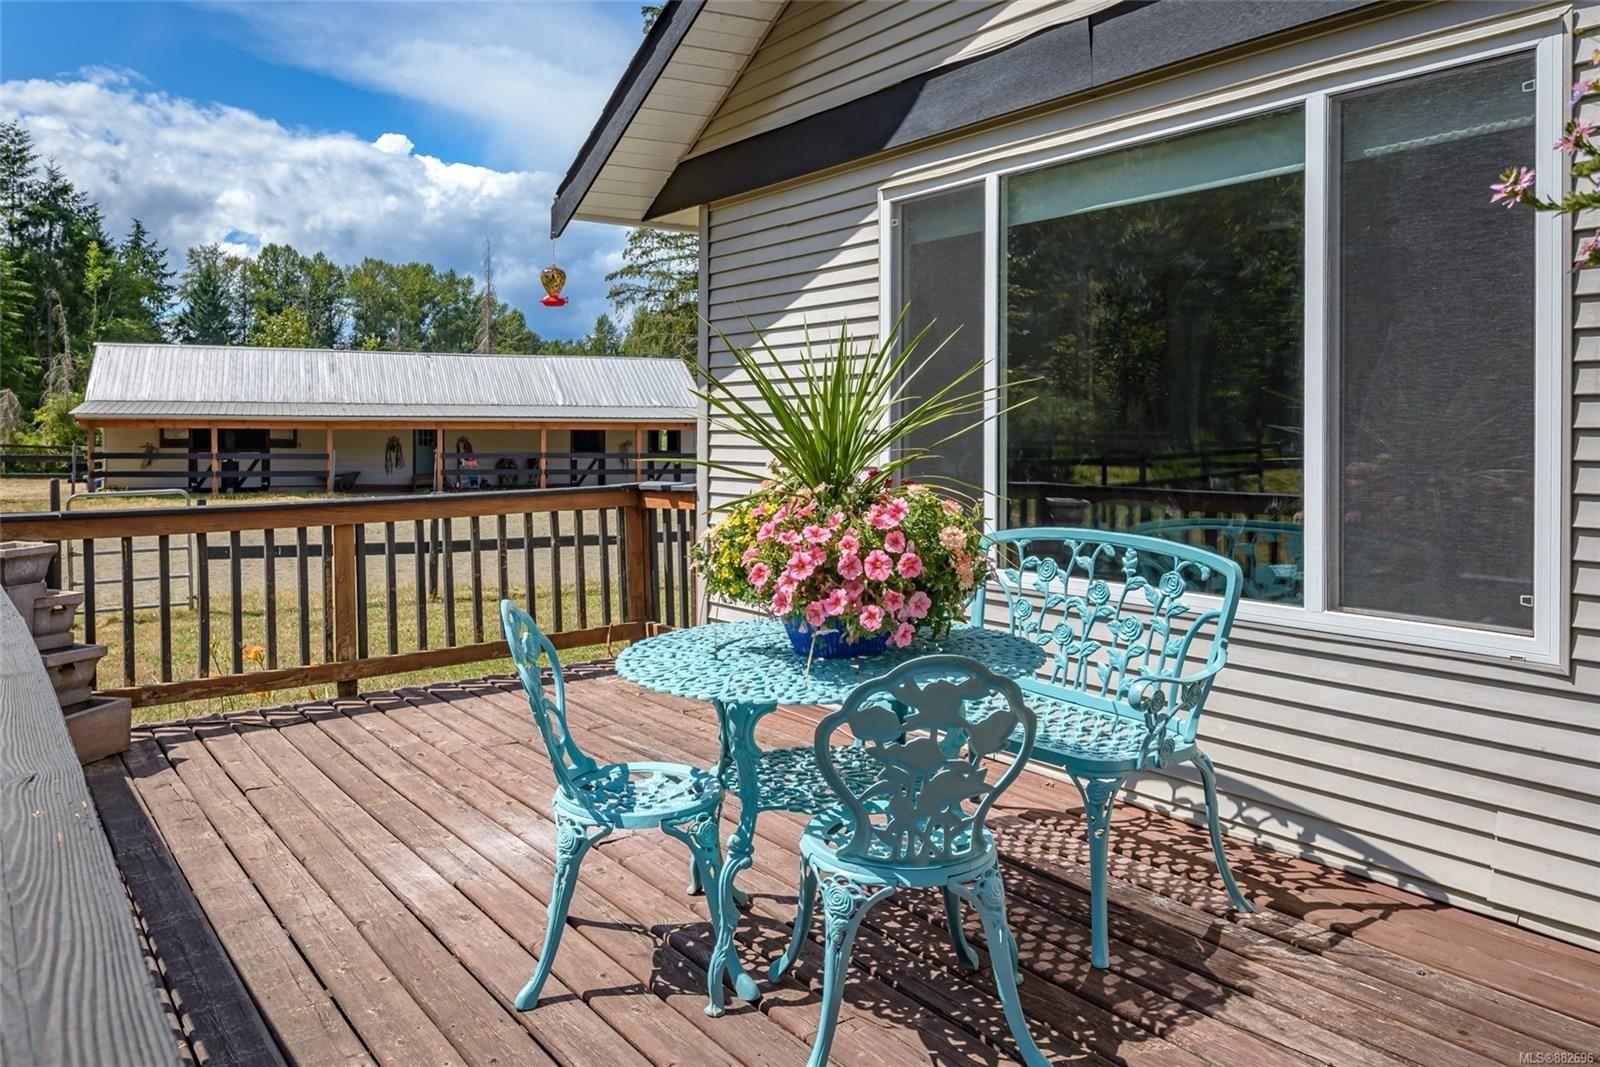 Photo 26: Photos: 3554 MacAulay Rd in : CV Merville Black Creek House for sale (Comox Valley)  : MLS®# 882696